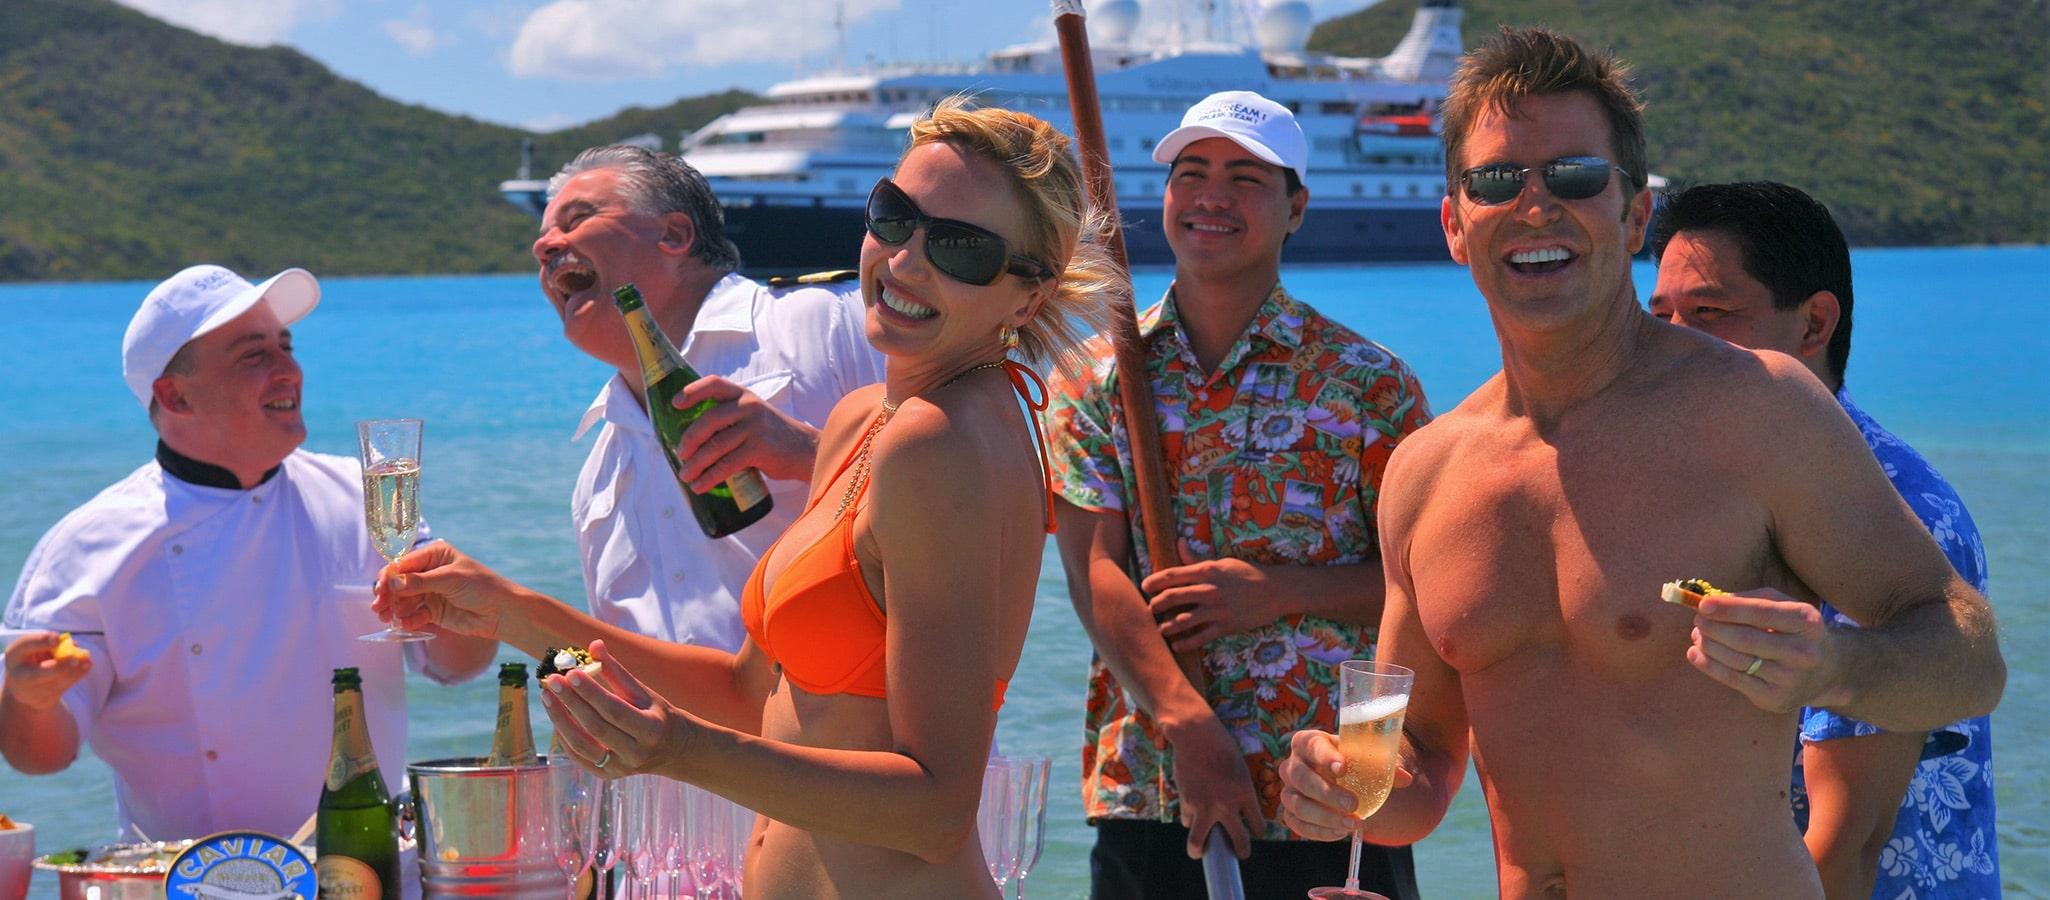 Ein Event der Extraklasse: Champagner- & Kaviar-Splash am Karibikstrand.